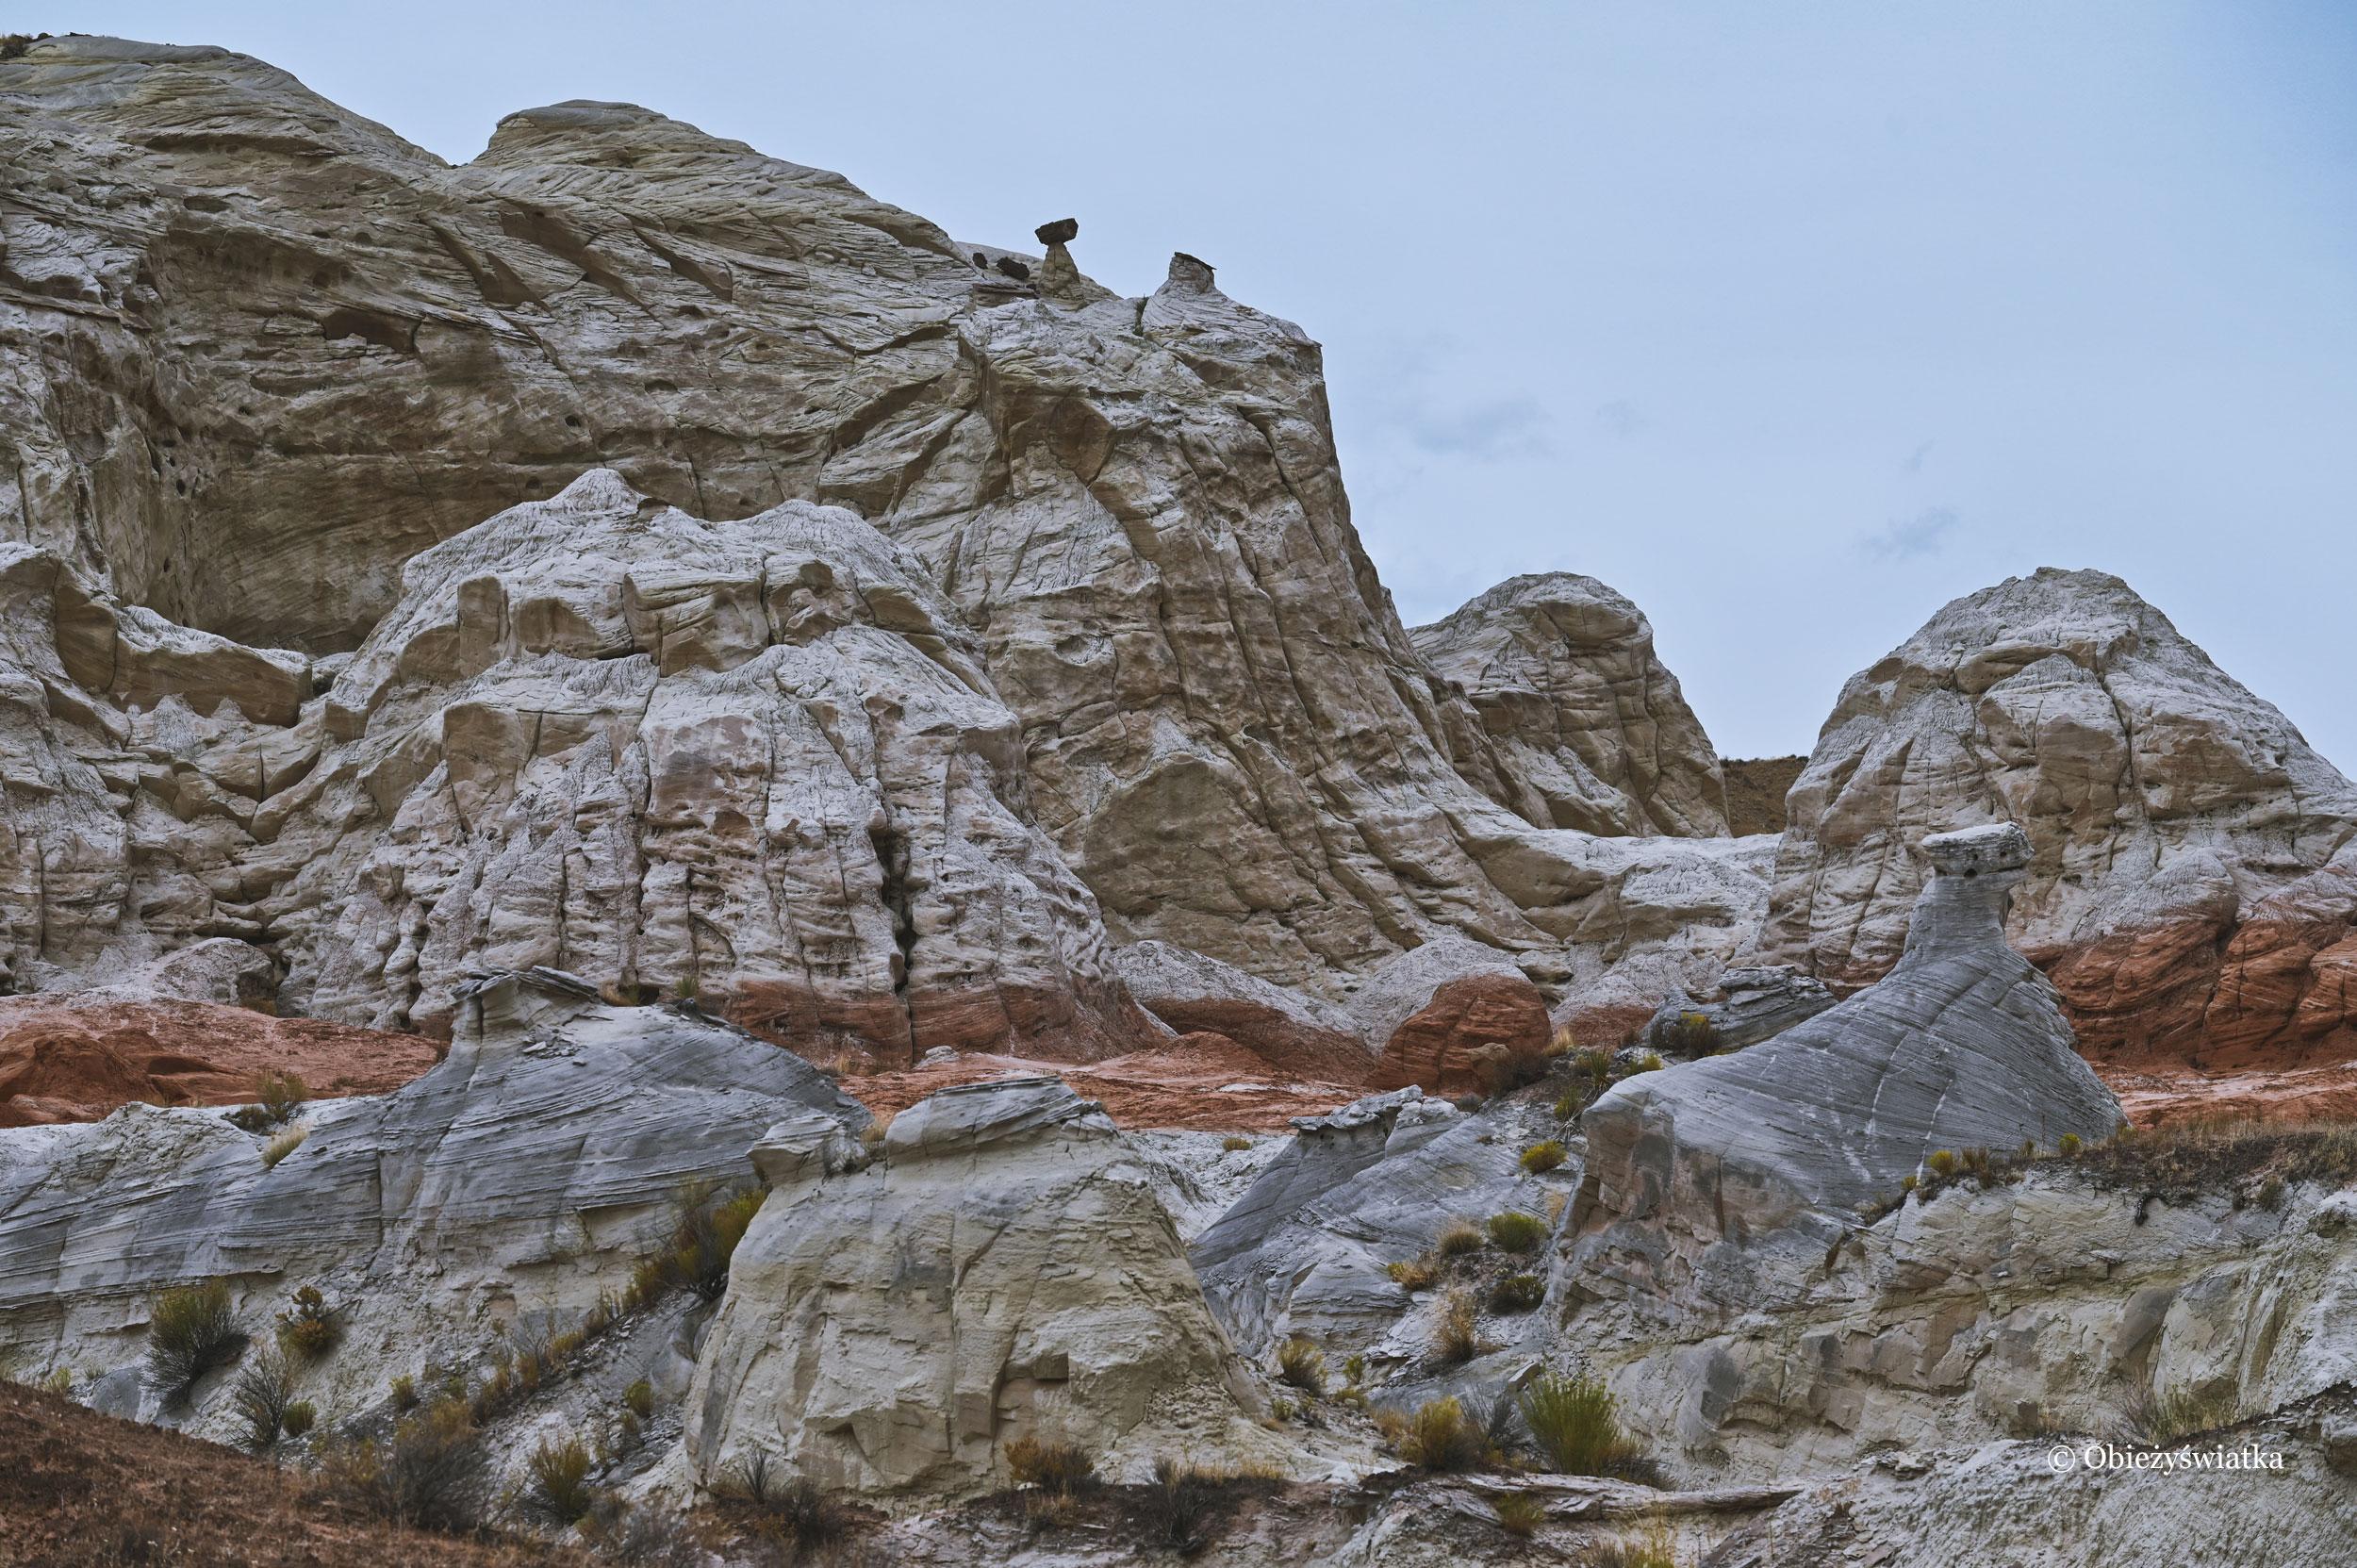 Między skałami, Toadstools Trail, Utah